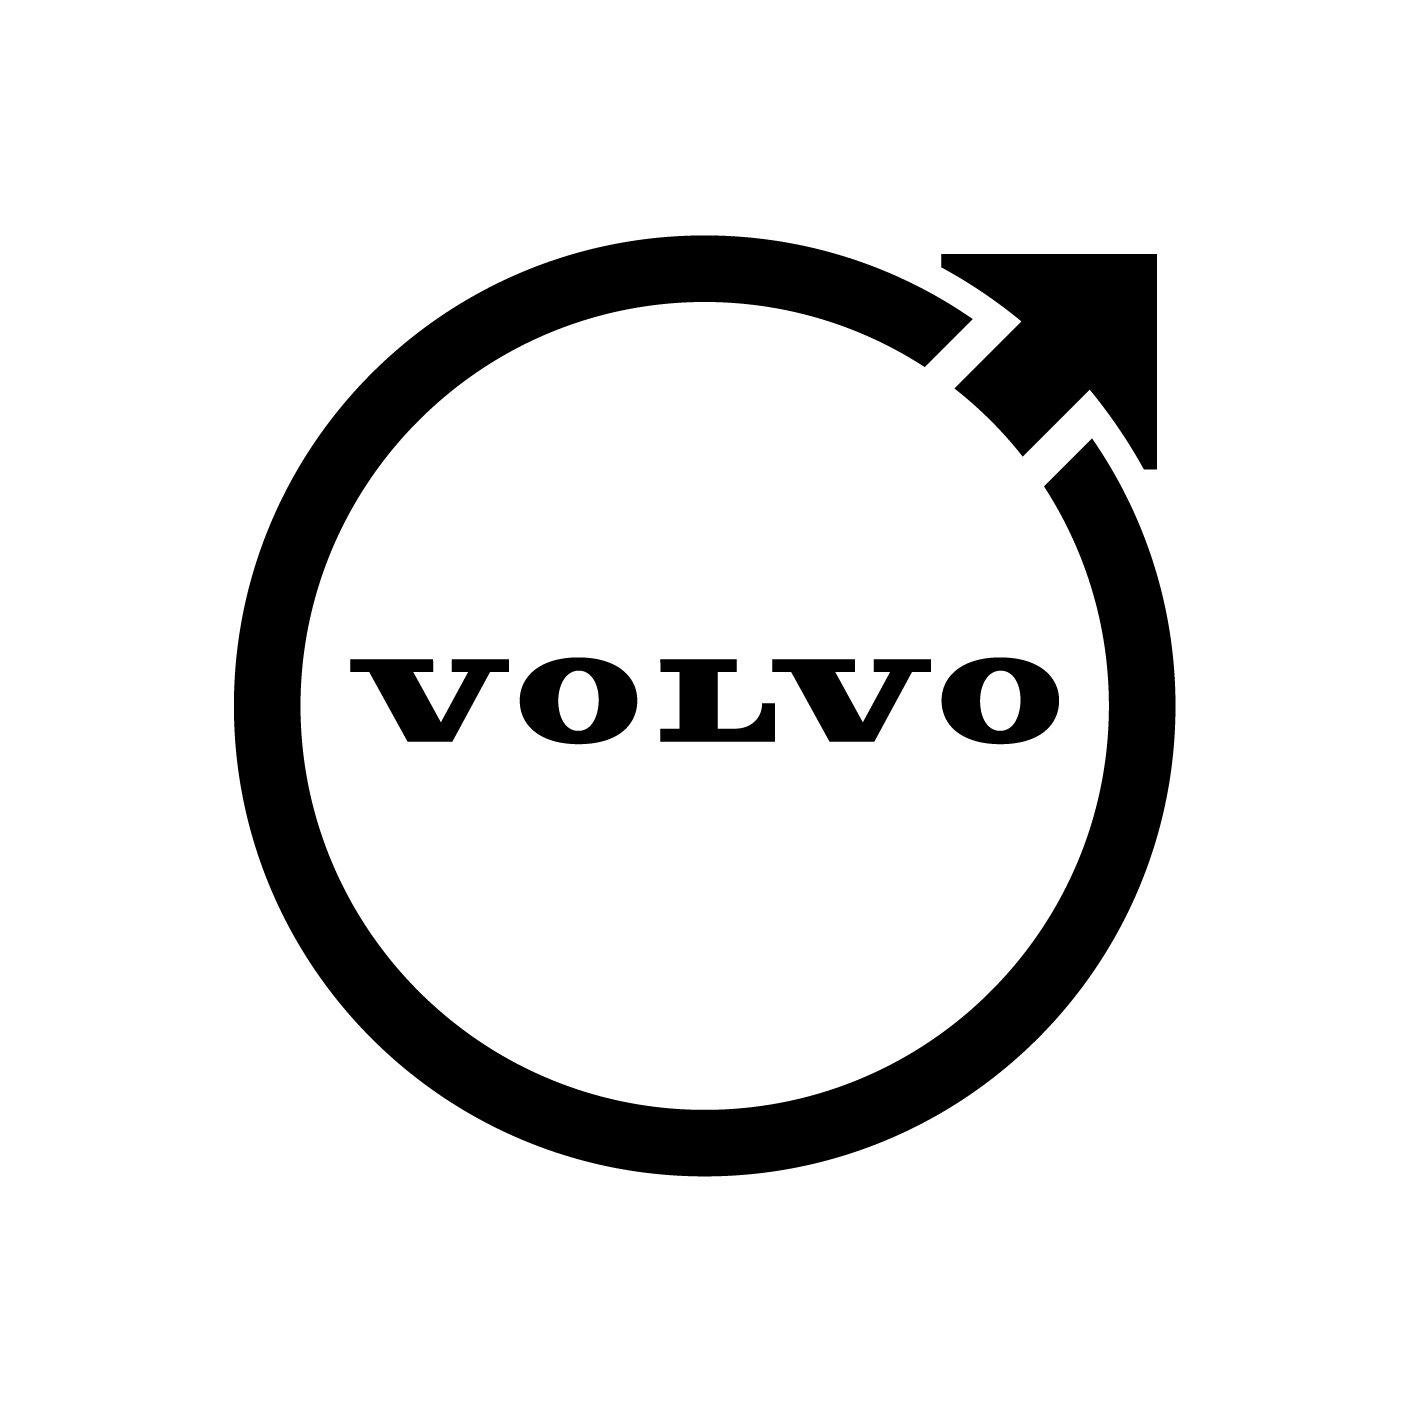 Volvo_Iron mark_b_Original